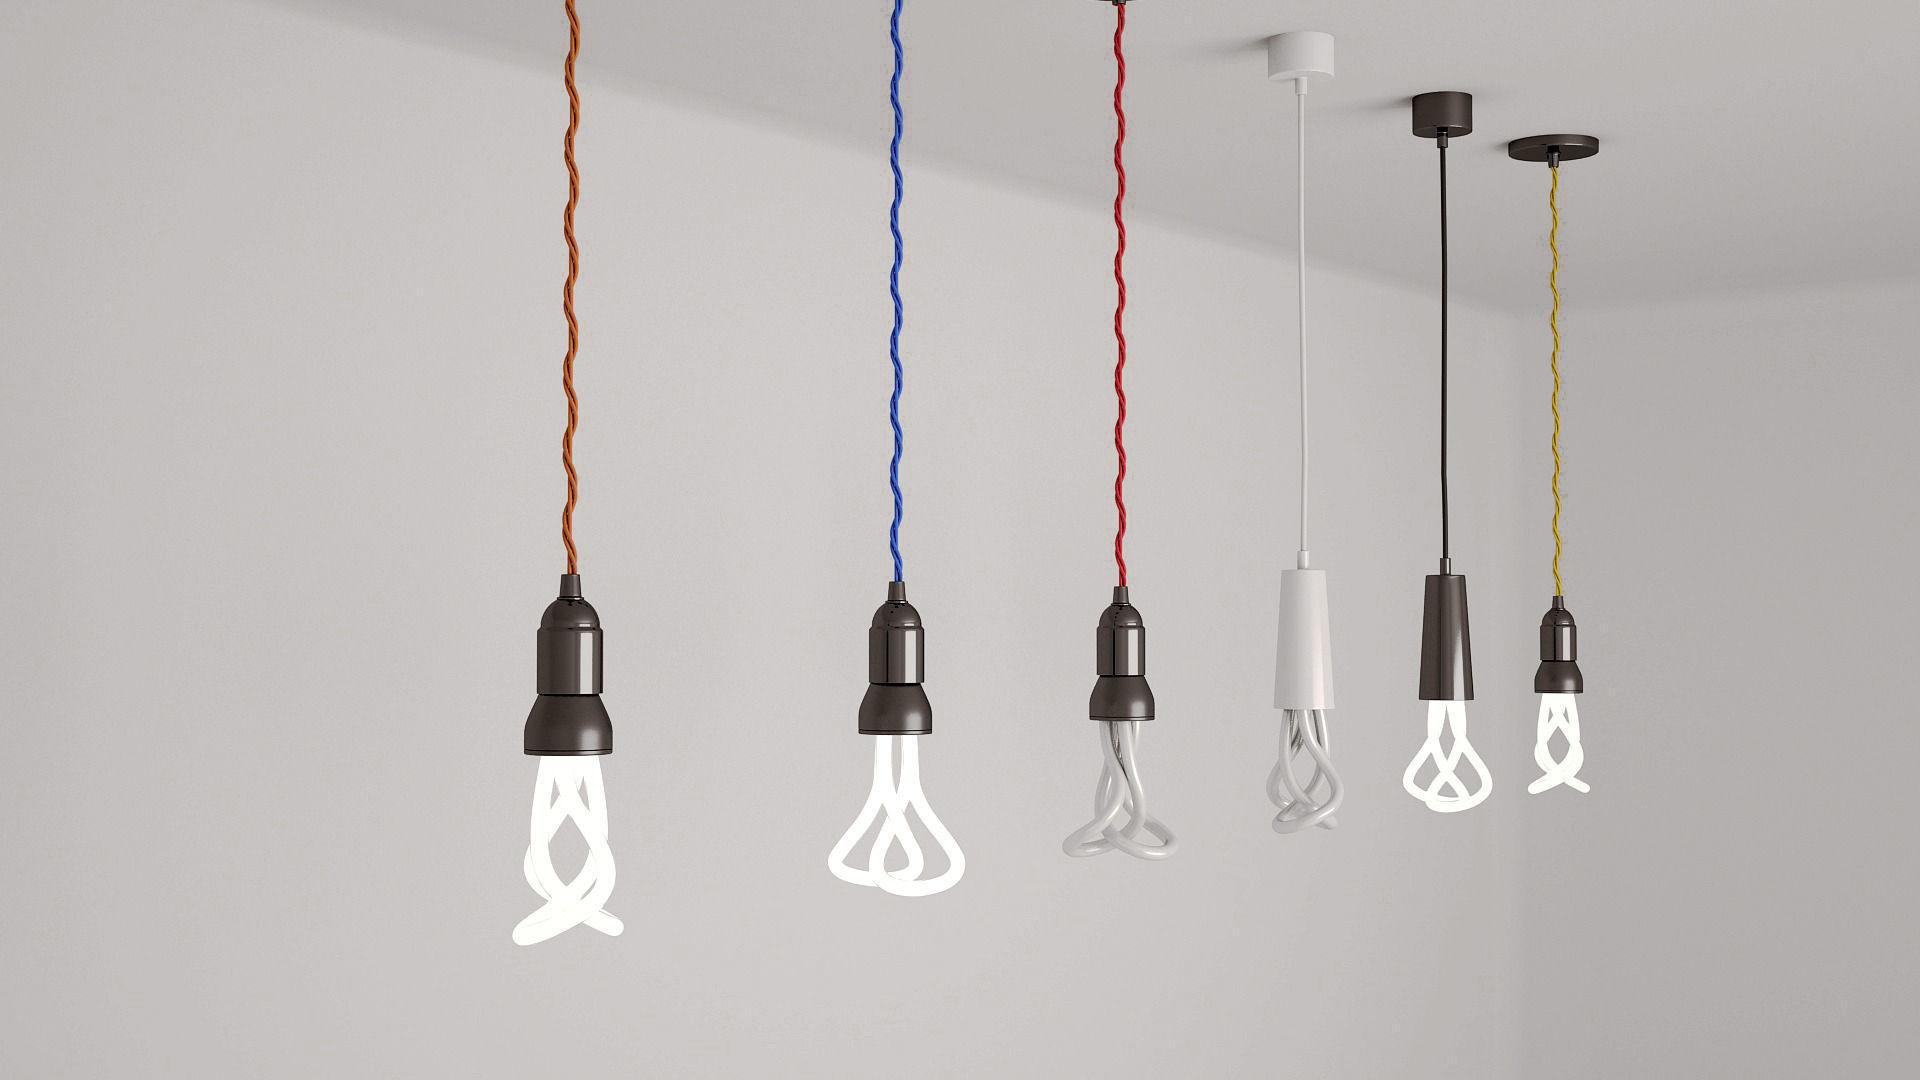 light bulb pendant concrete pendant light bulbs 3d model max obj mtl fbx 3d pendant light cgtrader